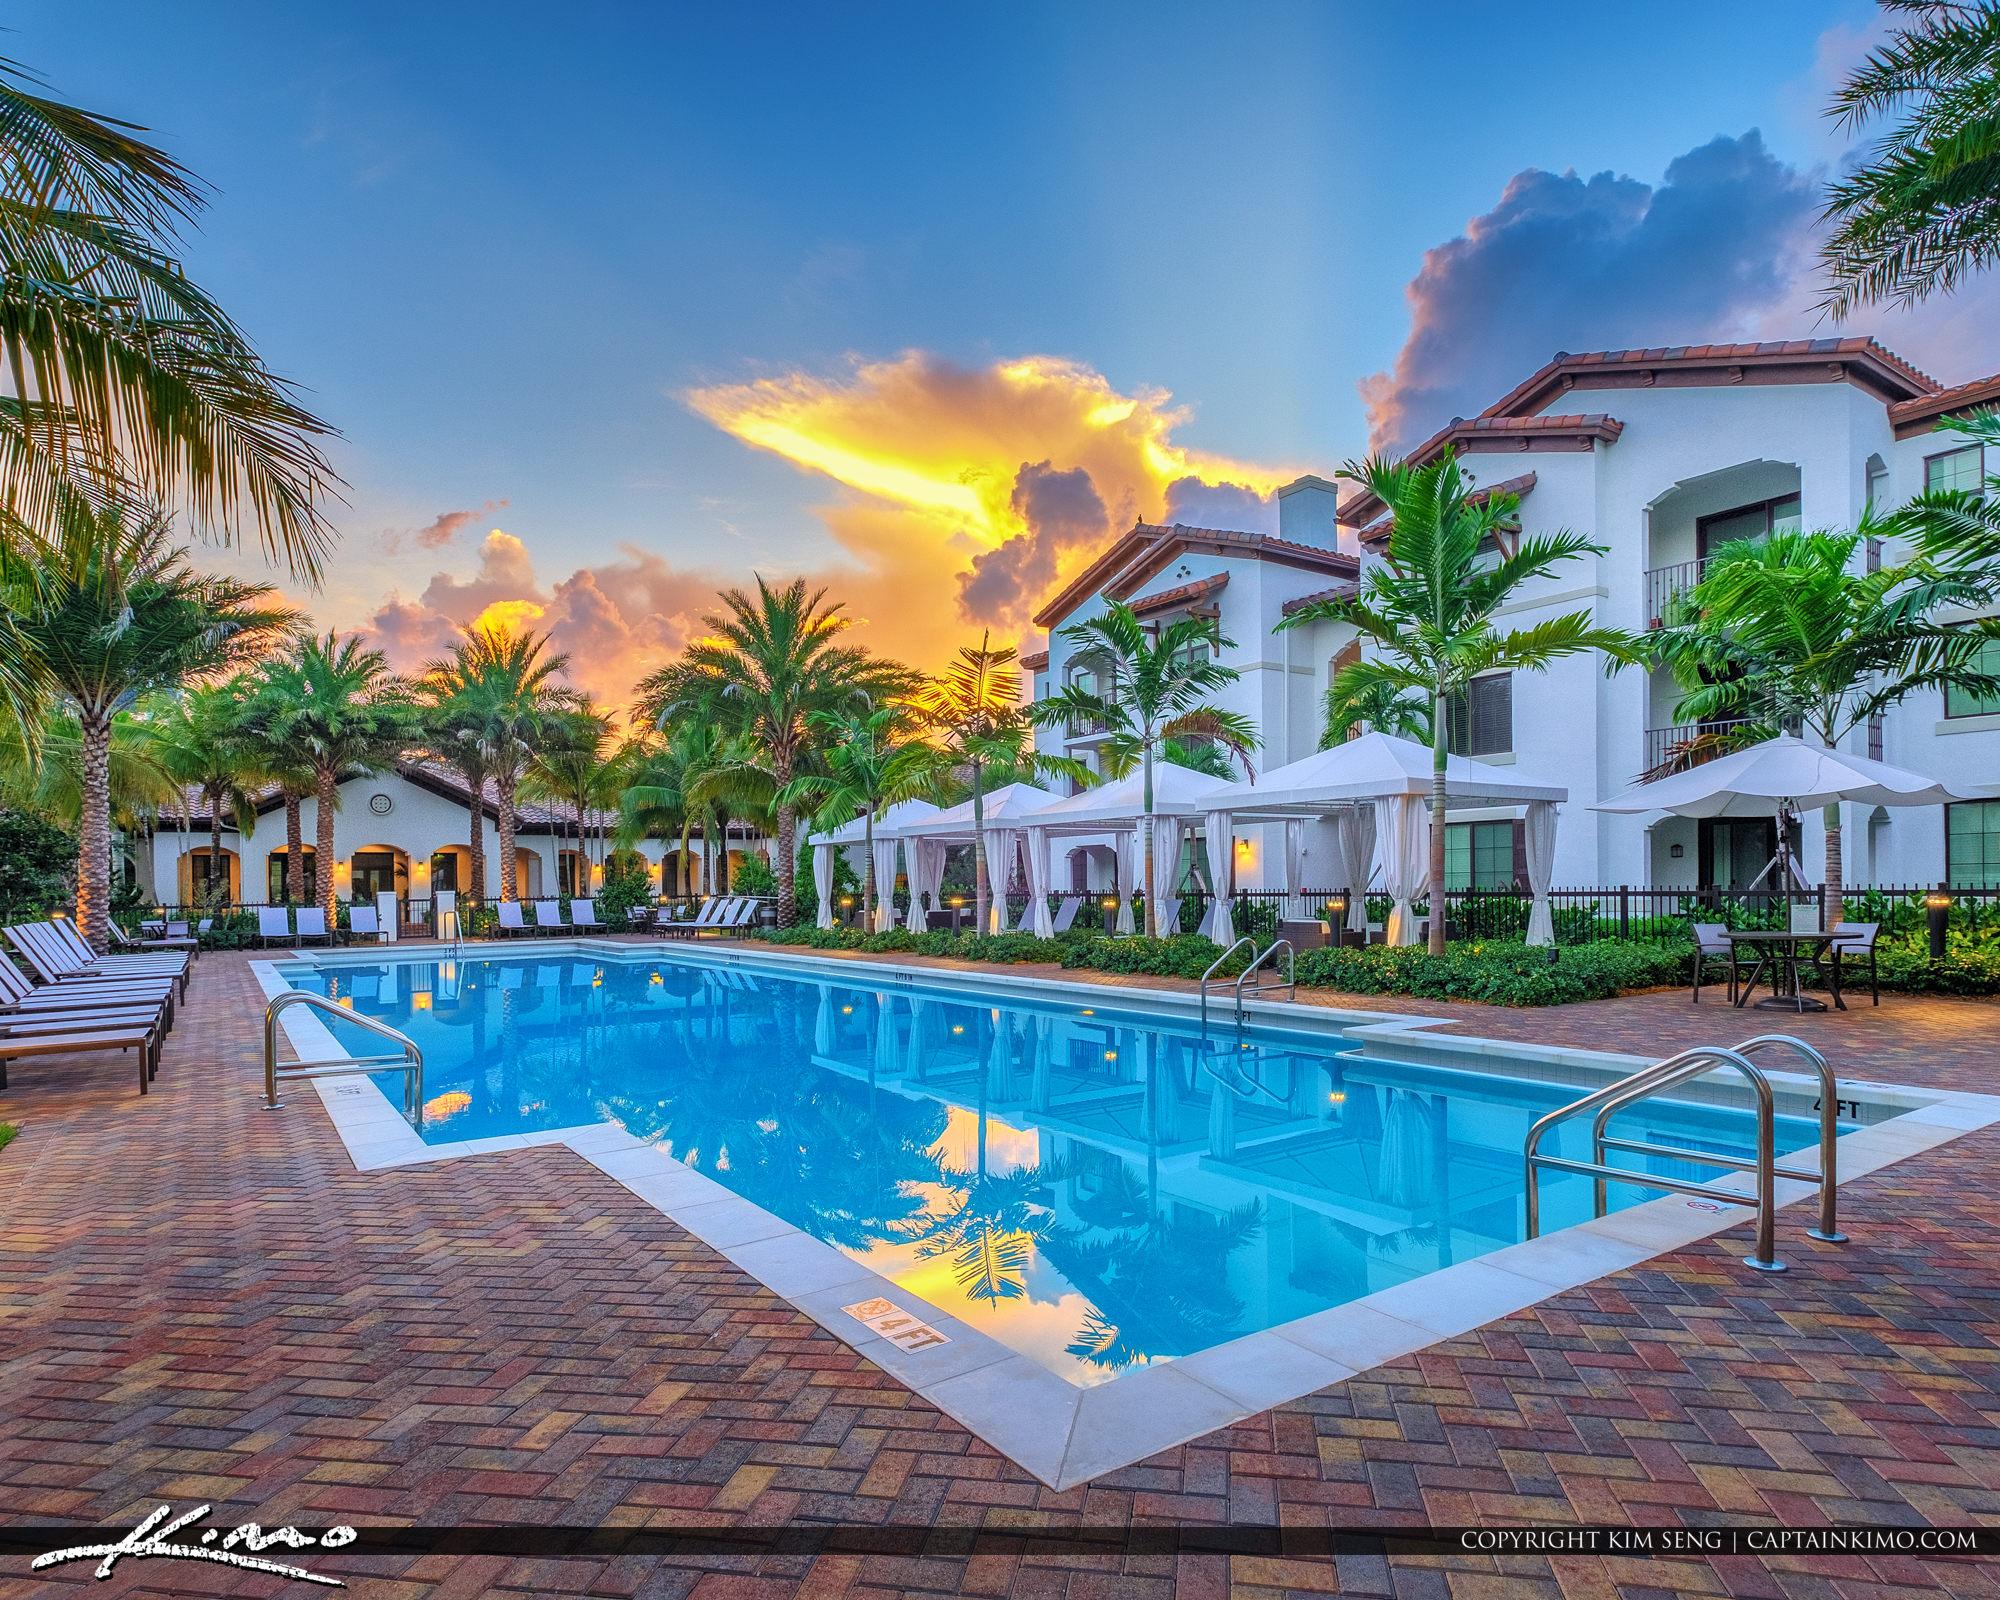 ParcStation Hollywood Florida Sunrise at the Pool